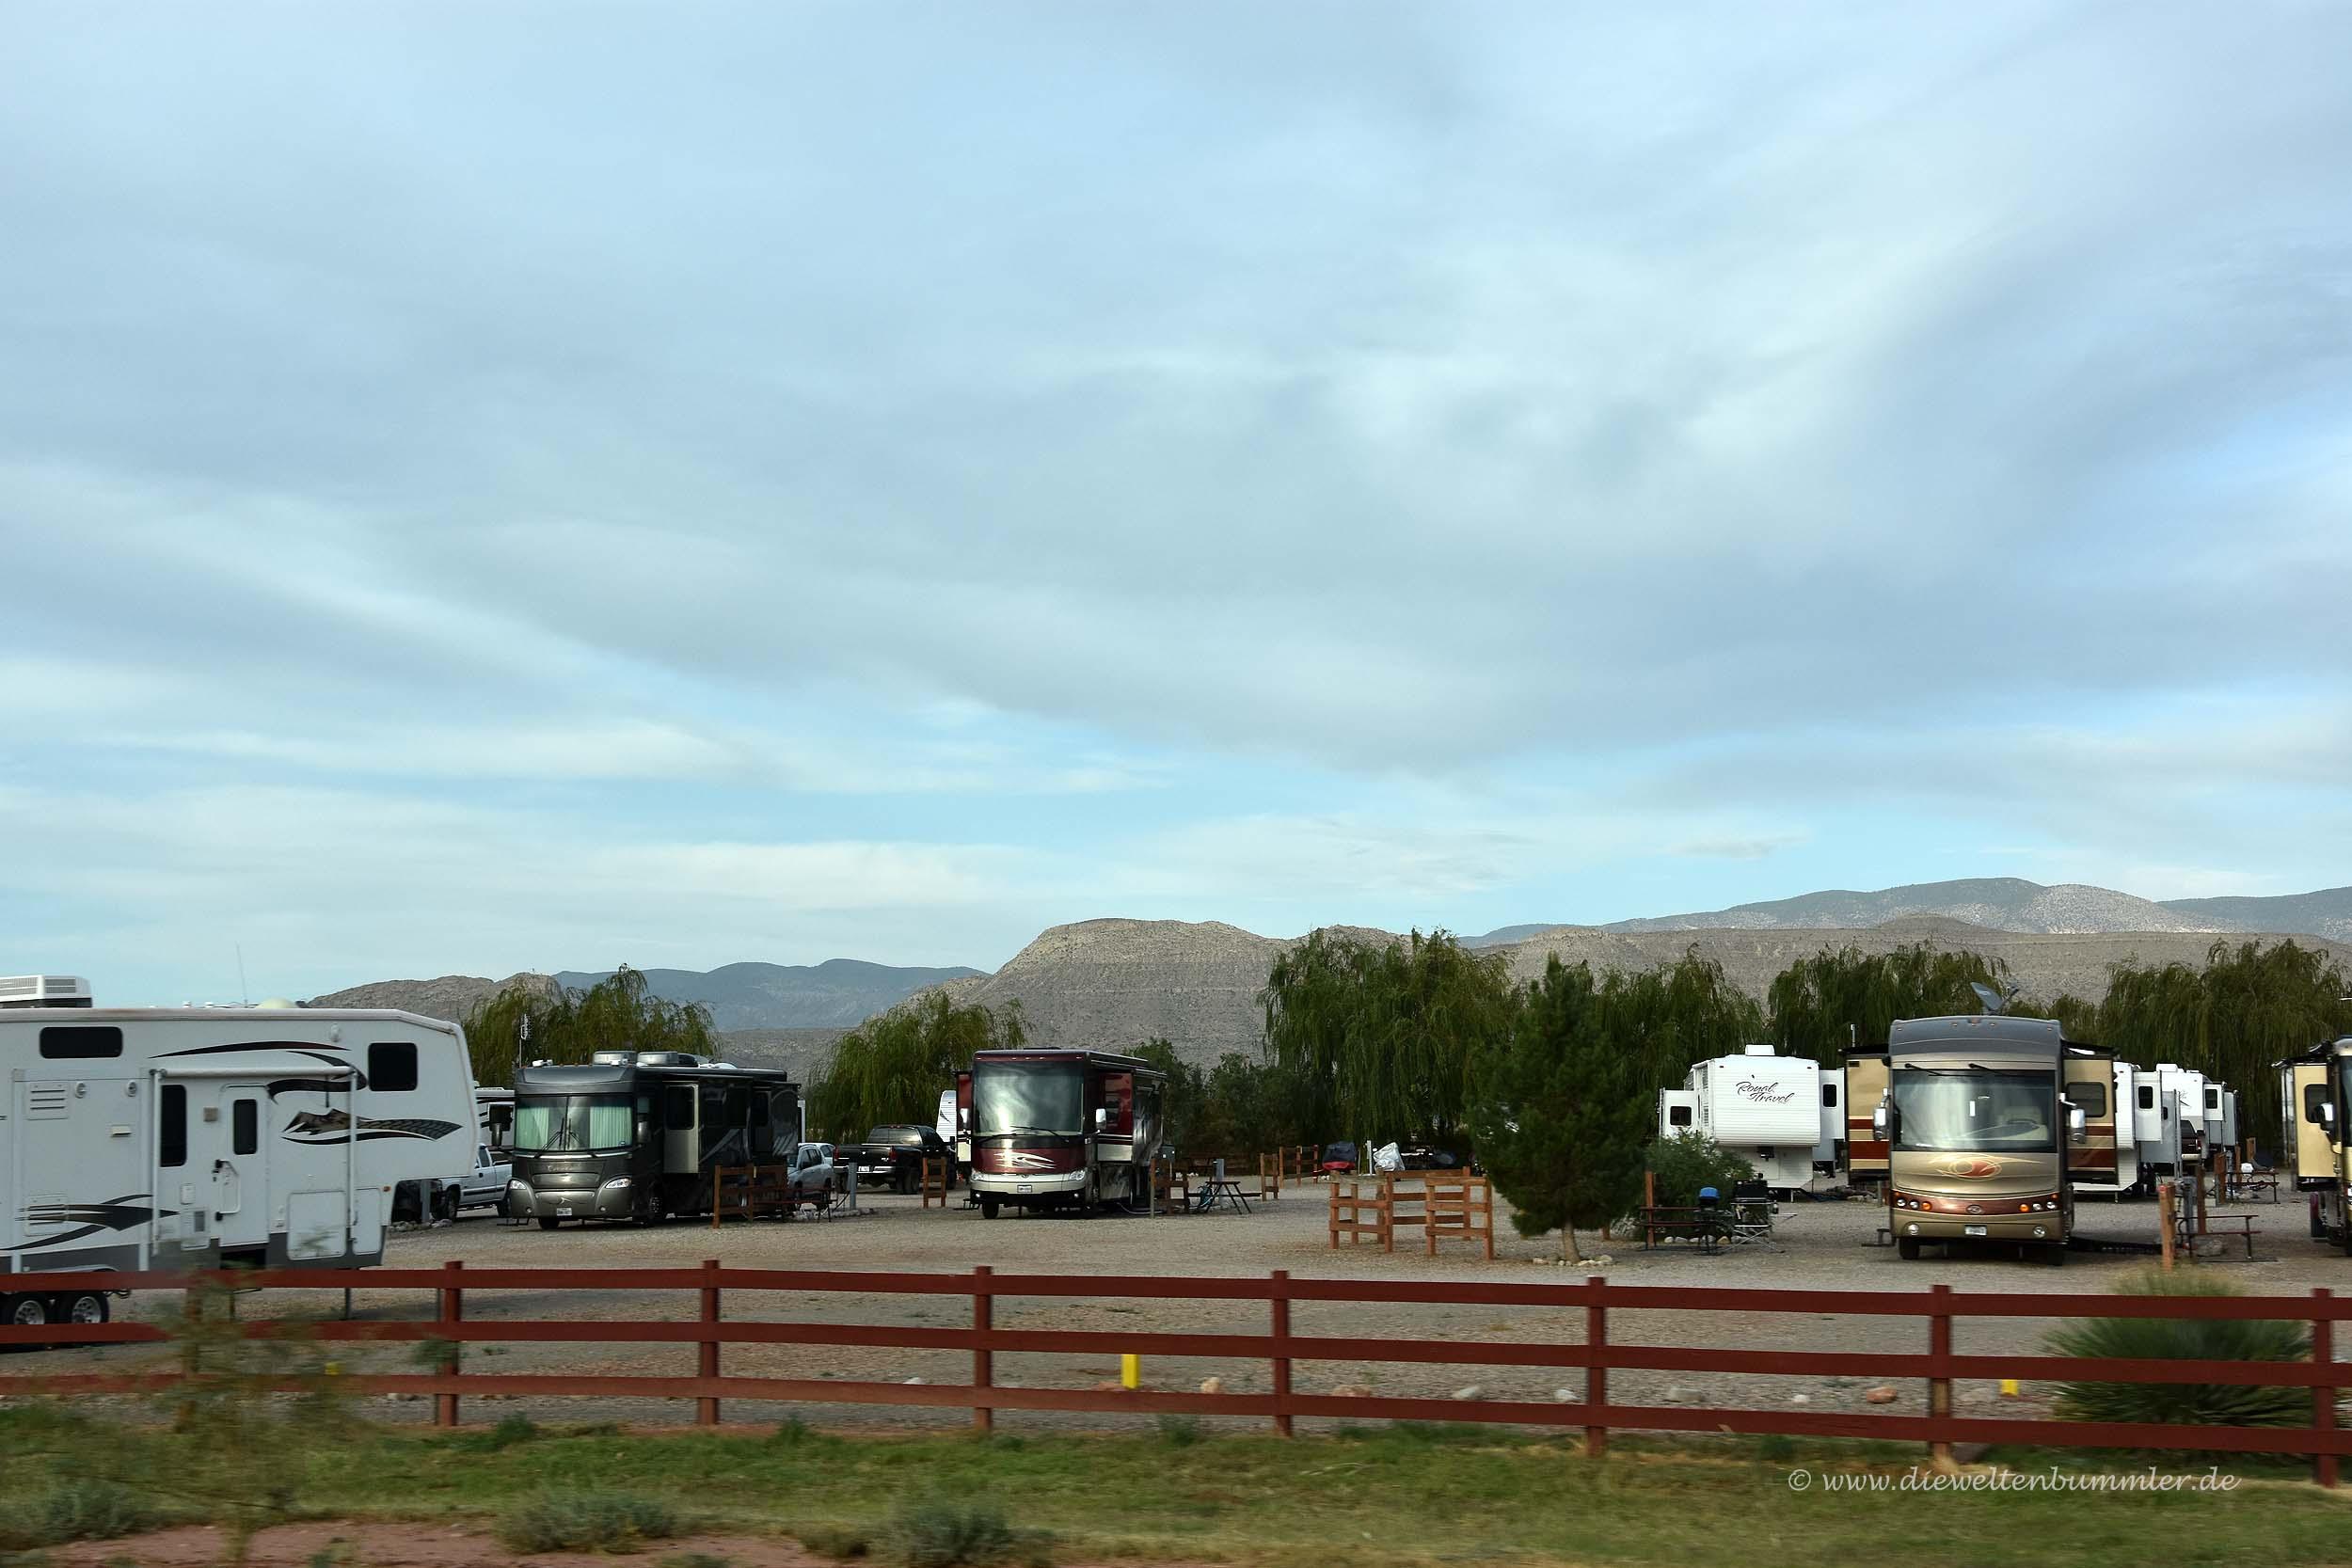 Campingplatz in New Mexico